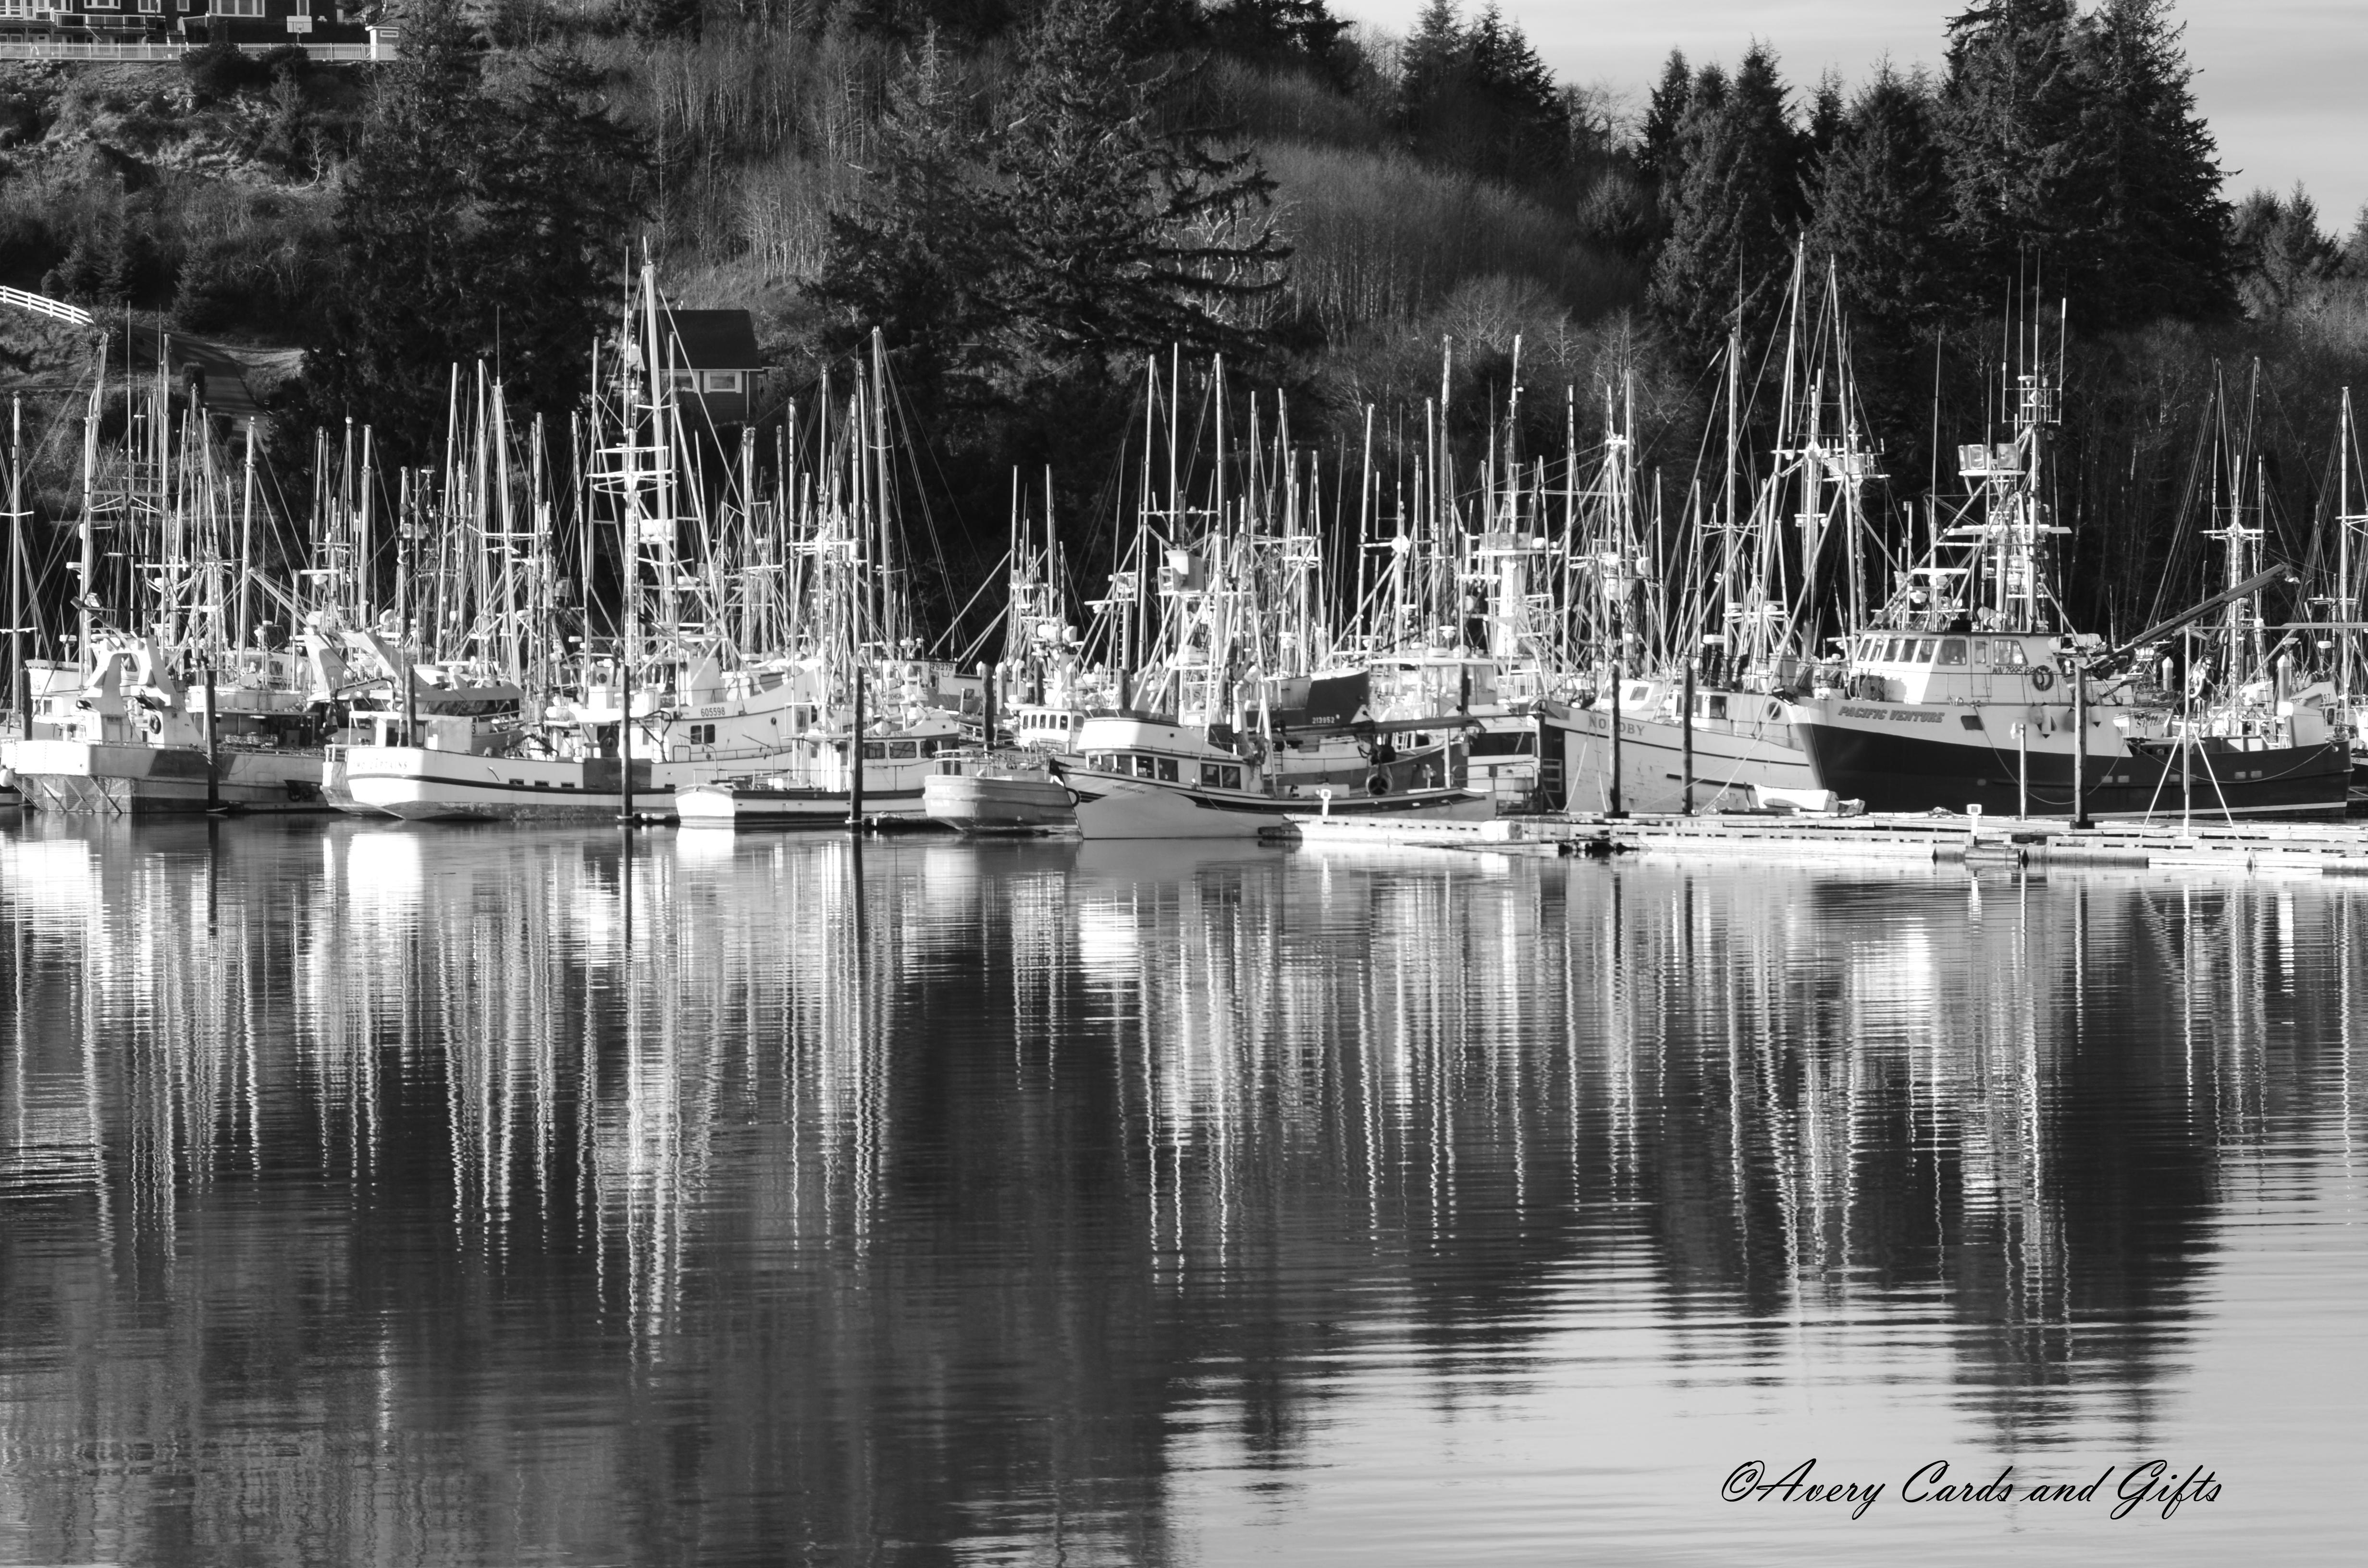 Ilwaco boats b&w.jpg